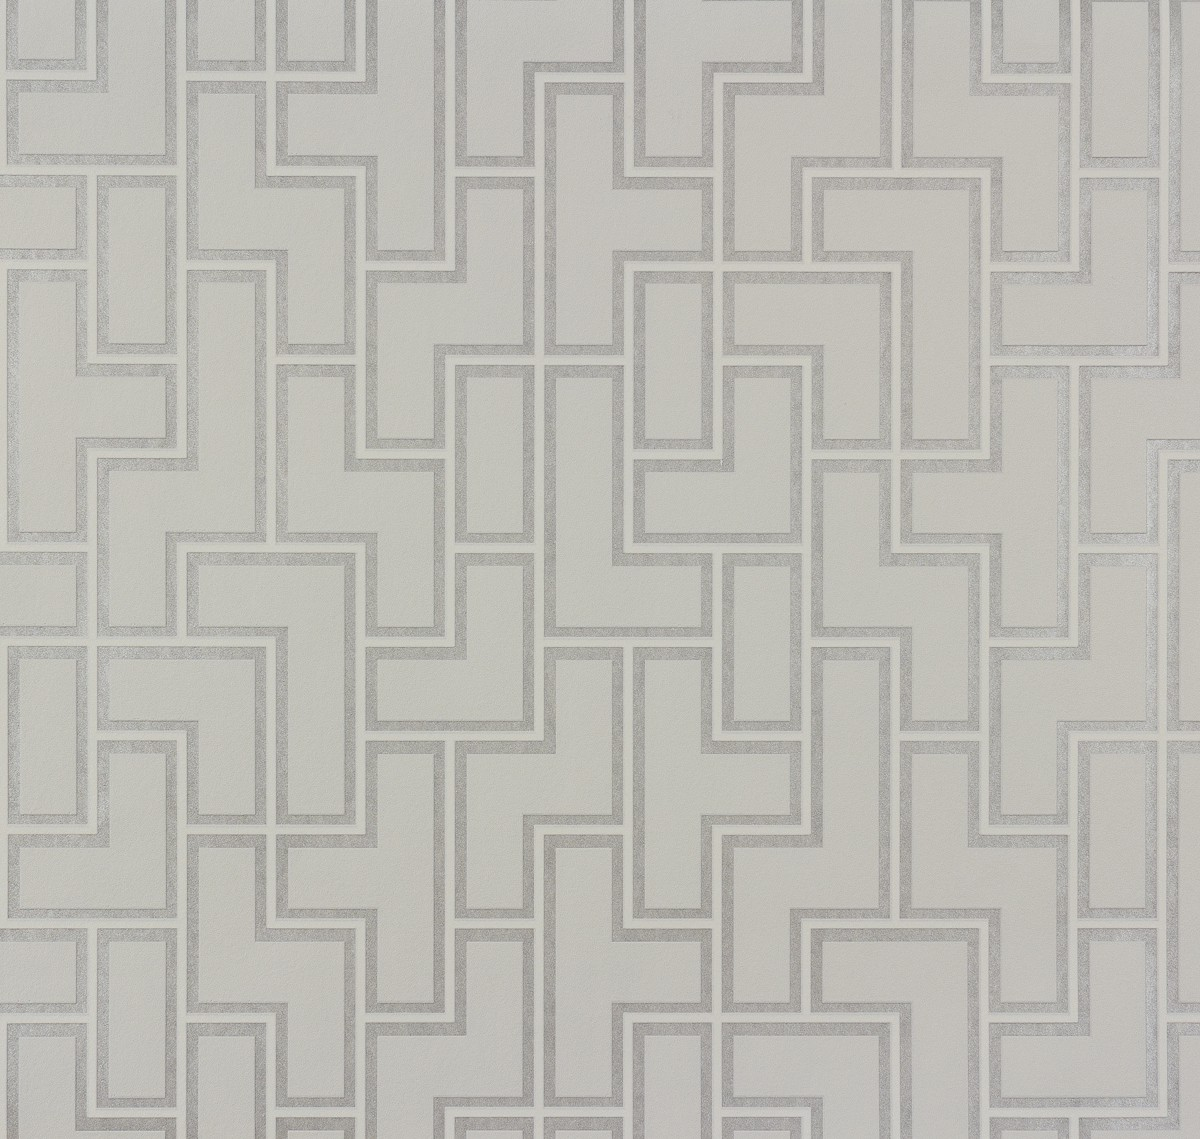 tapete michalsky metropolis grafisch grau 93937 2. Black Bedroom Furniture Sets. Home Design Ideas